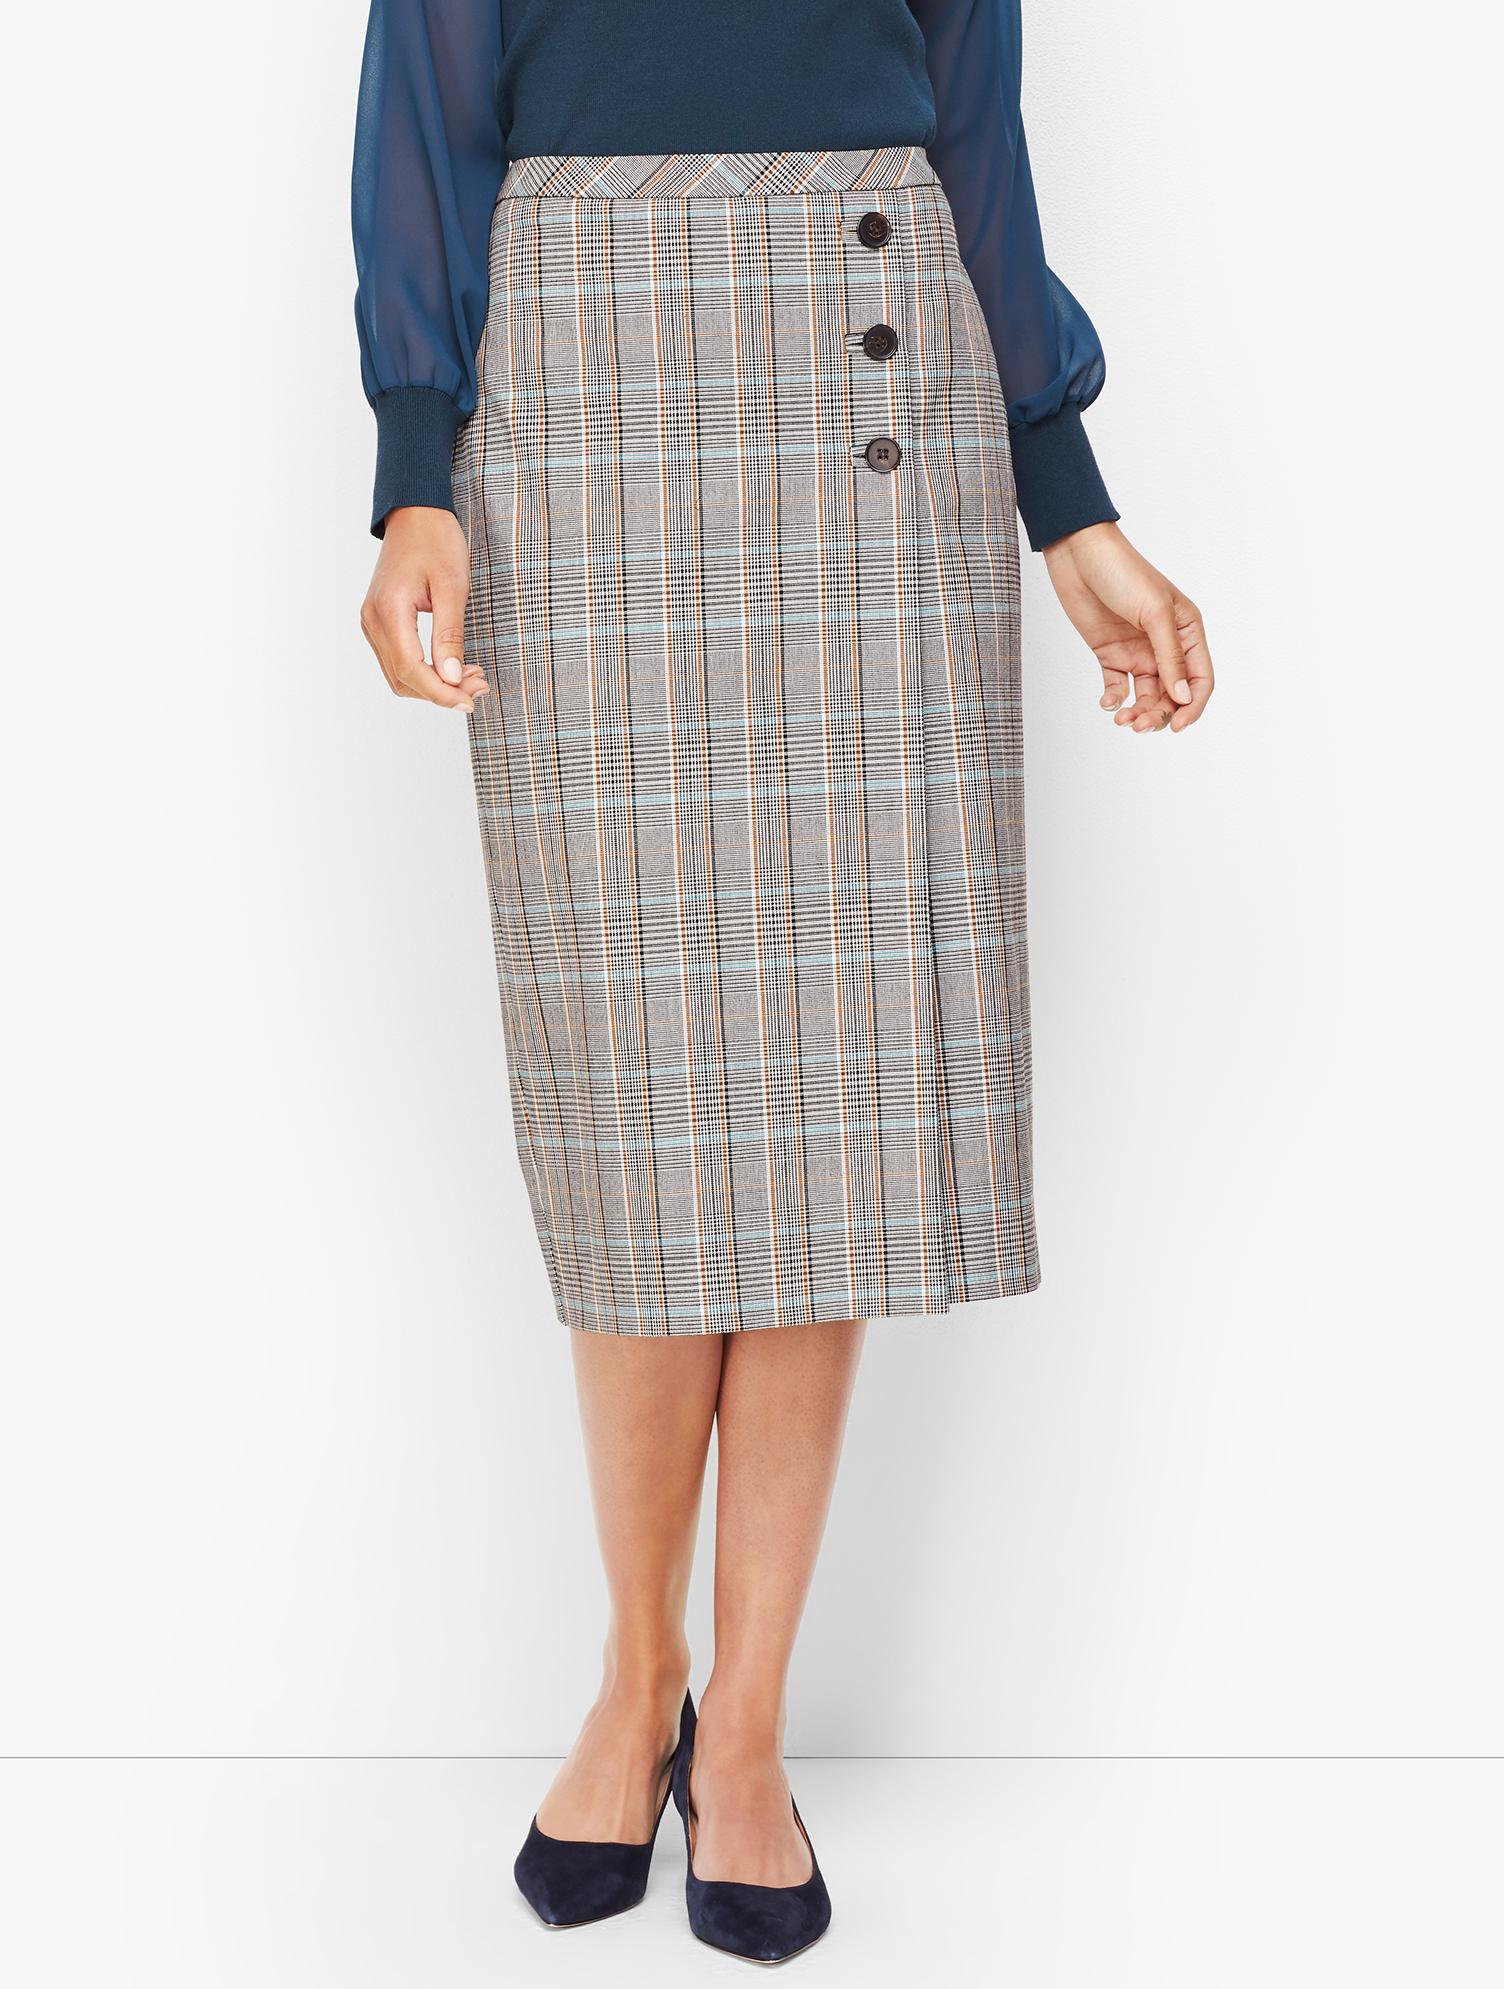 60s Skirts | 70s Hippie Skirts, Jumper Dresses Macintosh Plaid Faux Wrap Pencil Skirt - TEAL-BLUE-MULTI - 16 - Talbots $55.69 AT vintagedancer.com